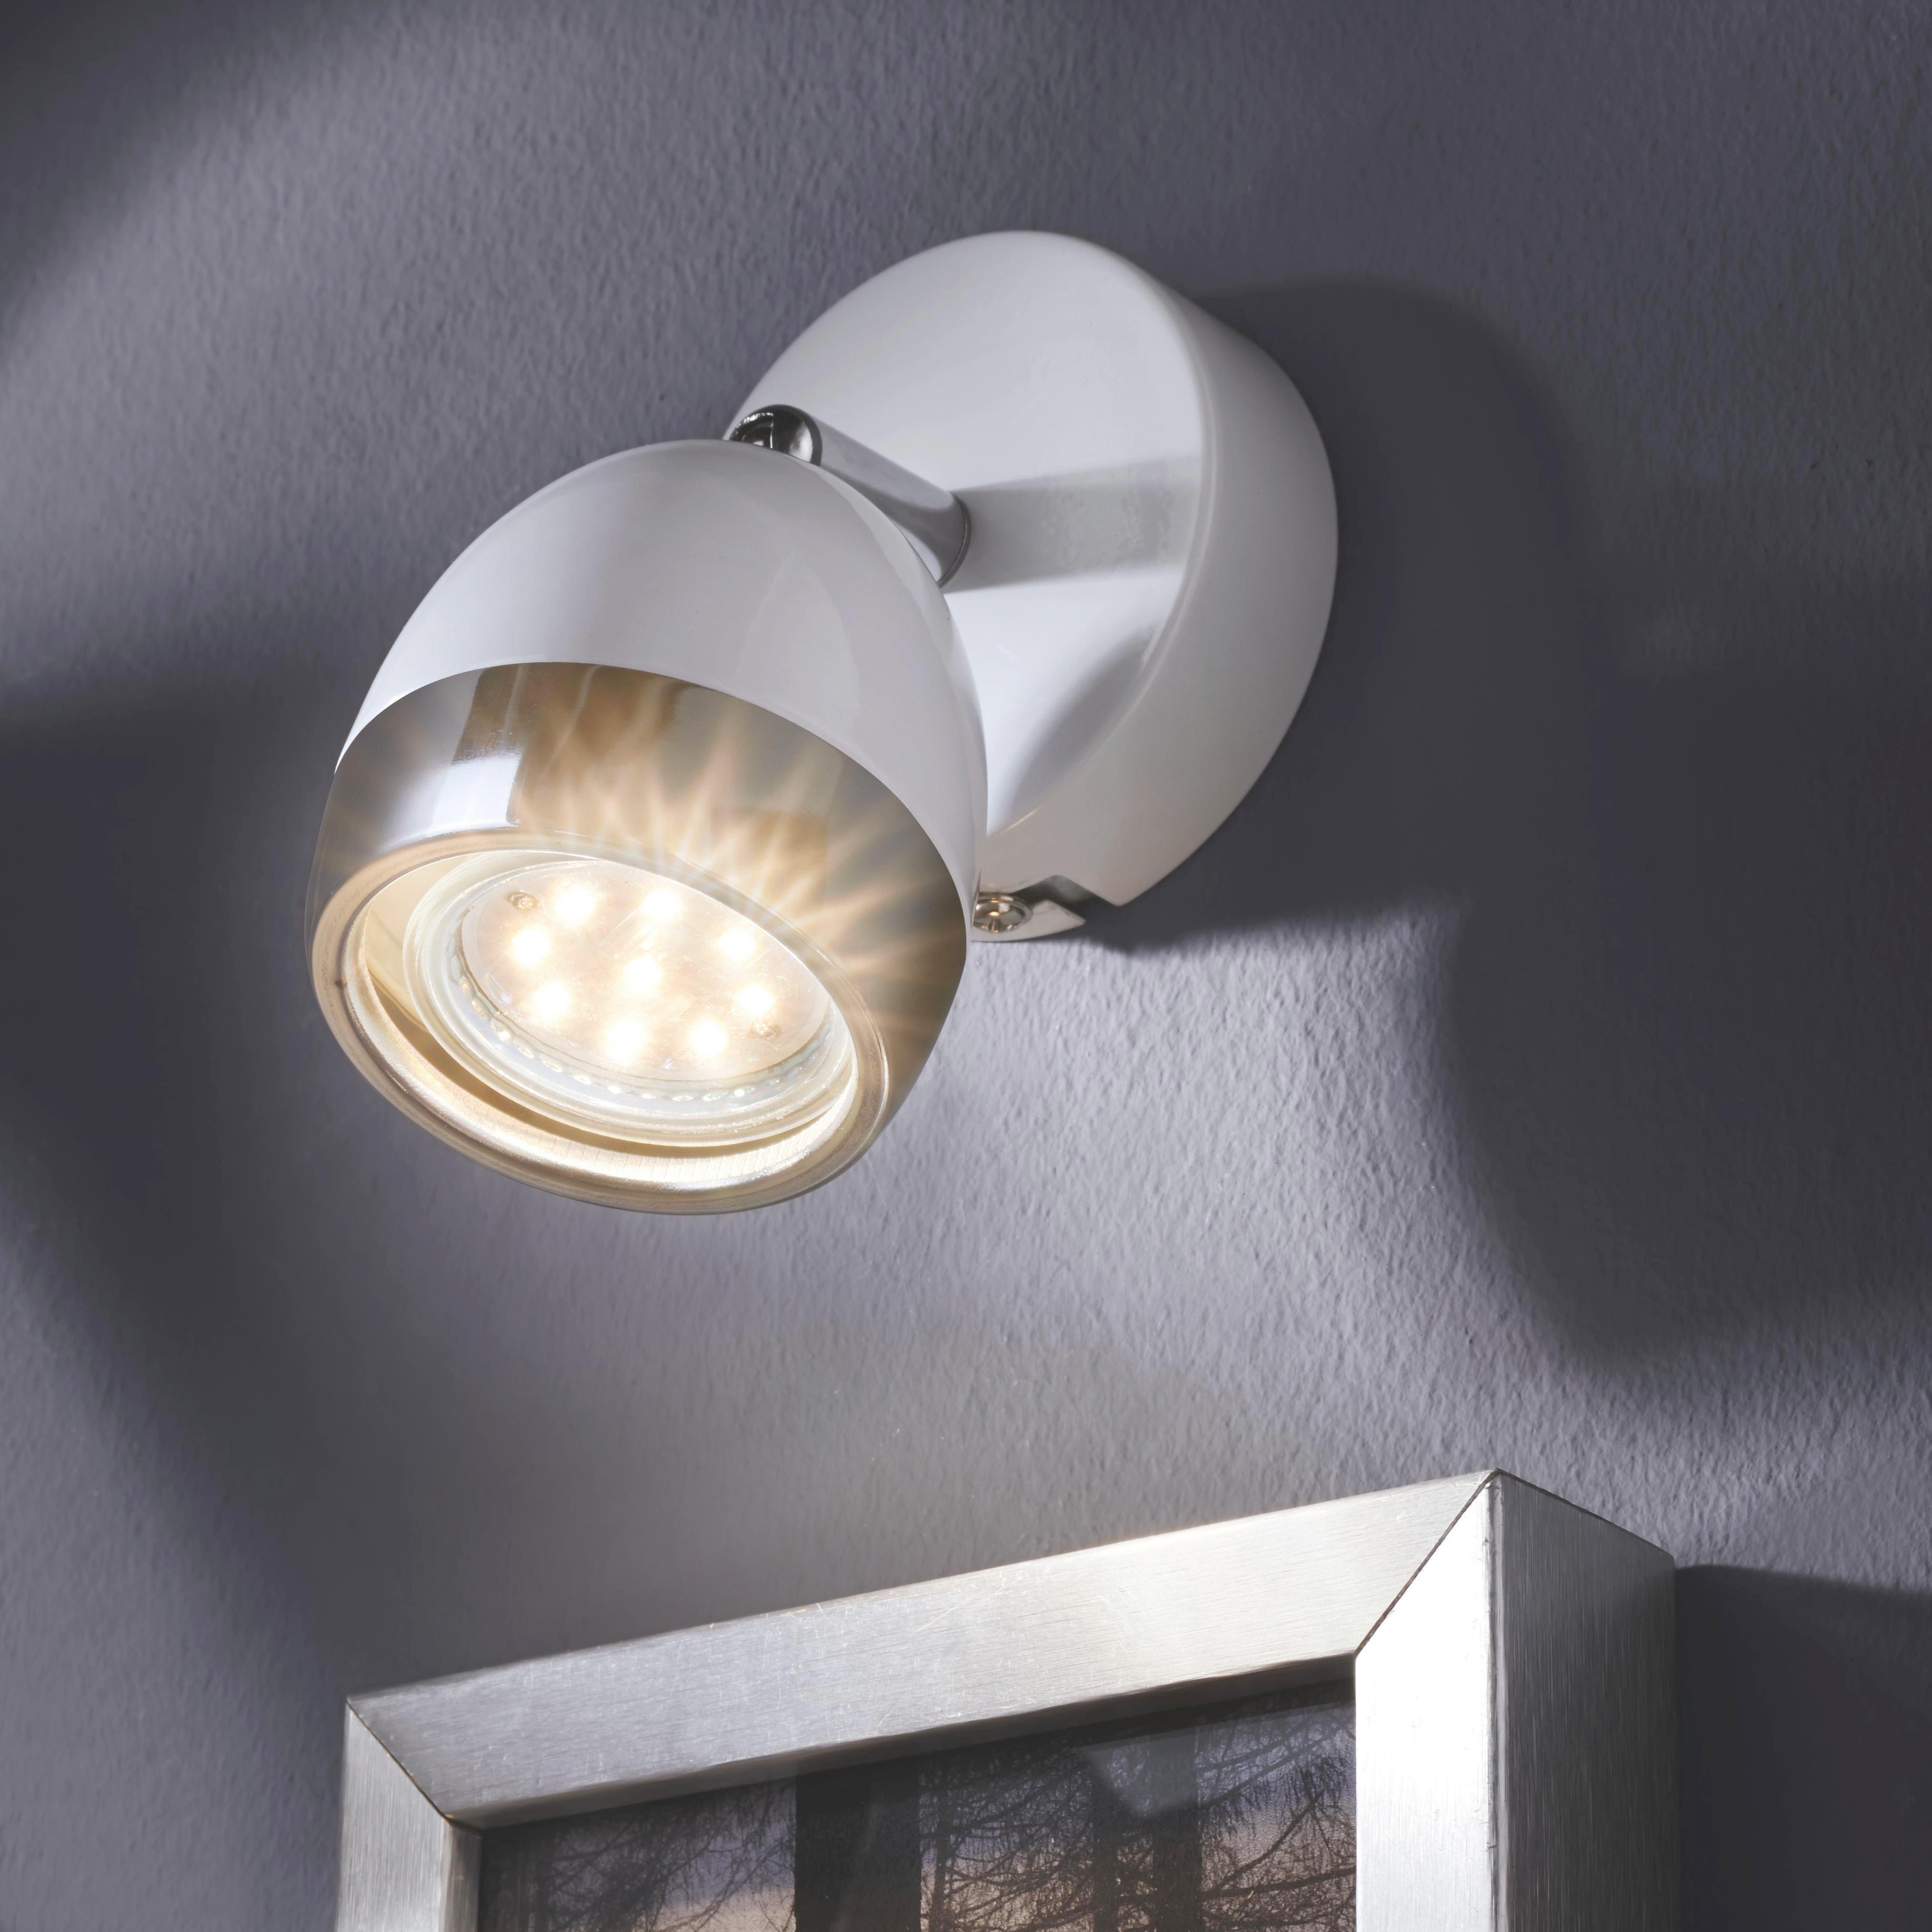 Strahler Nantes, max. 3 Watt - Chromfarben/Weiß, LIFESTYLE, Kunststoff/Metall (12,5/14cm) - MÖMAX modern living